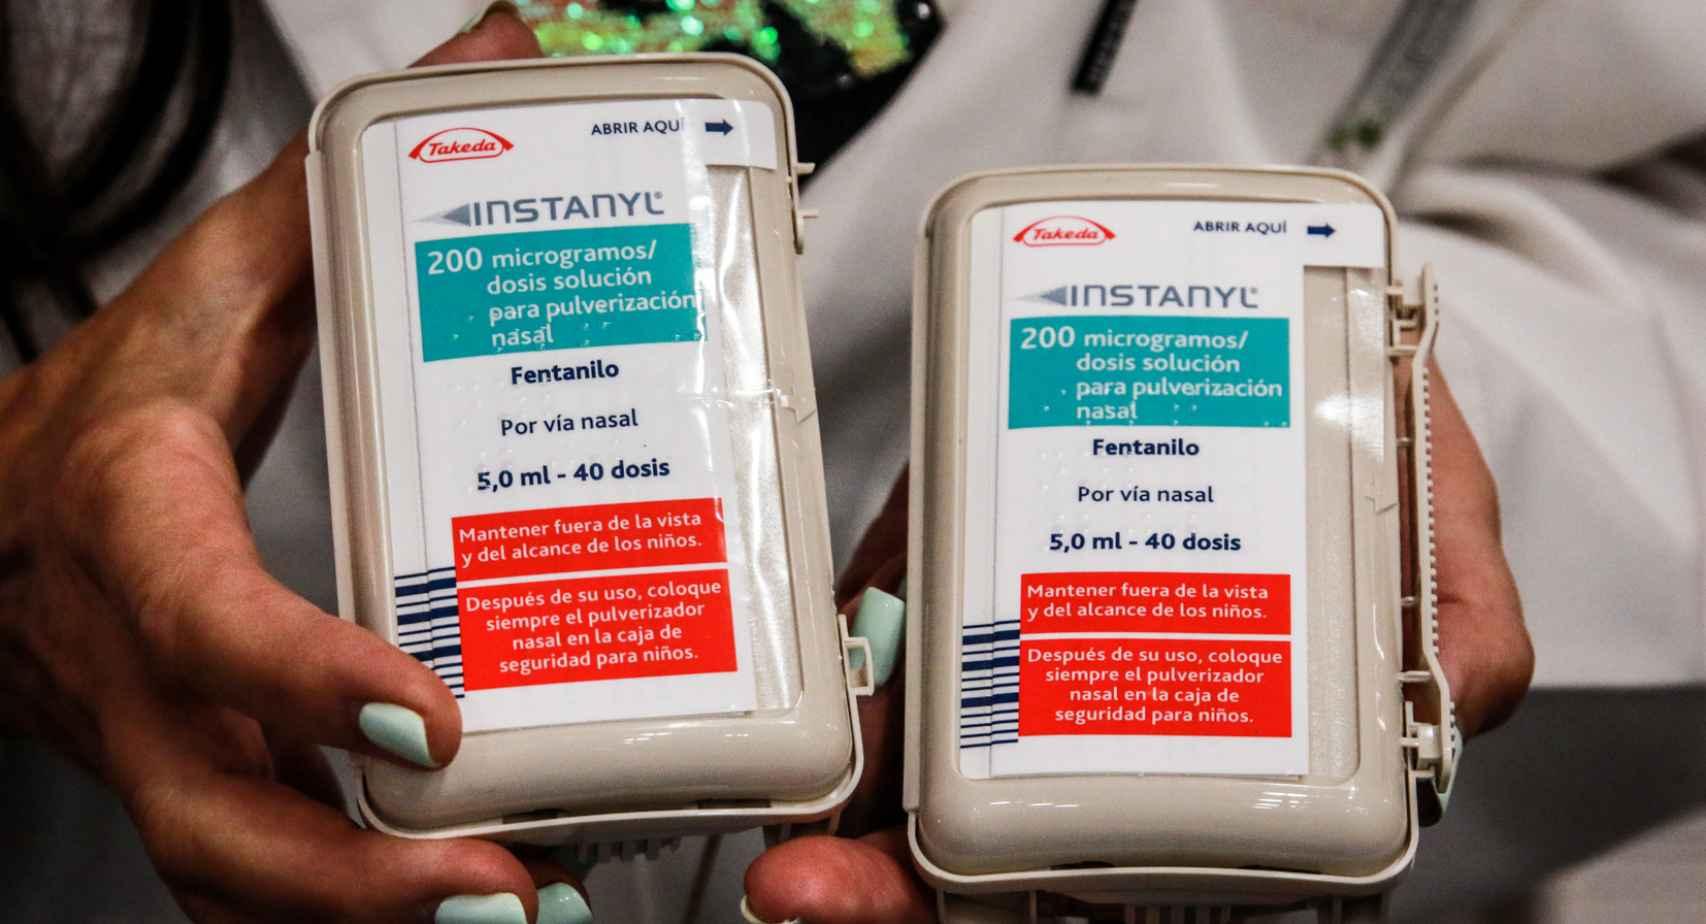 Dos envases de fentanilo de administración nasal.